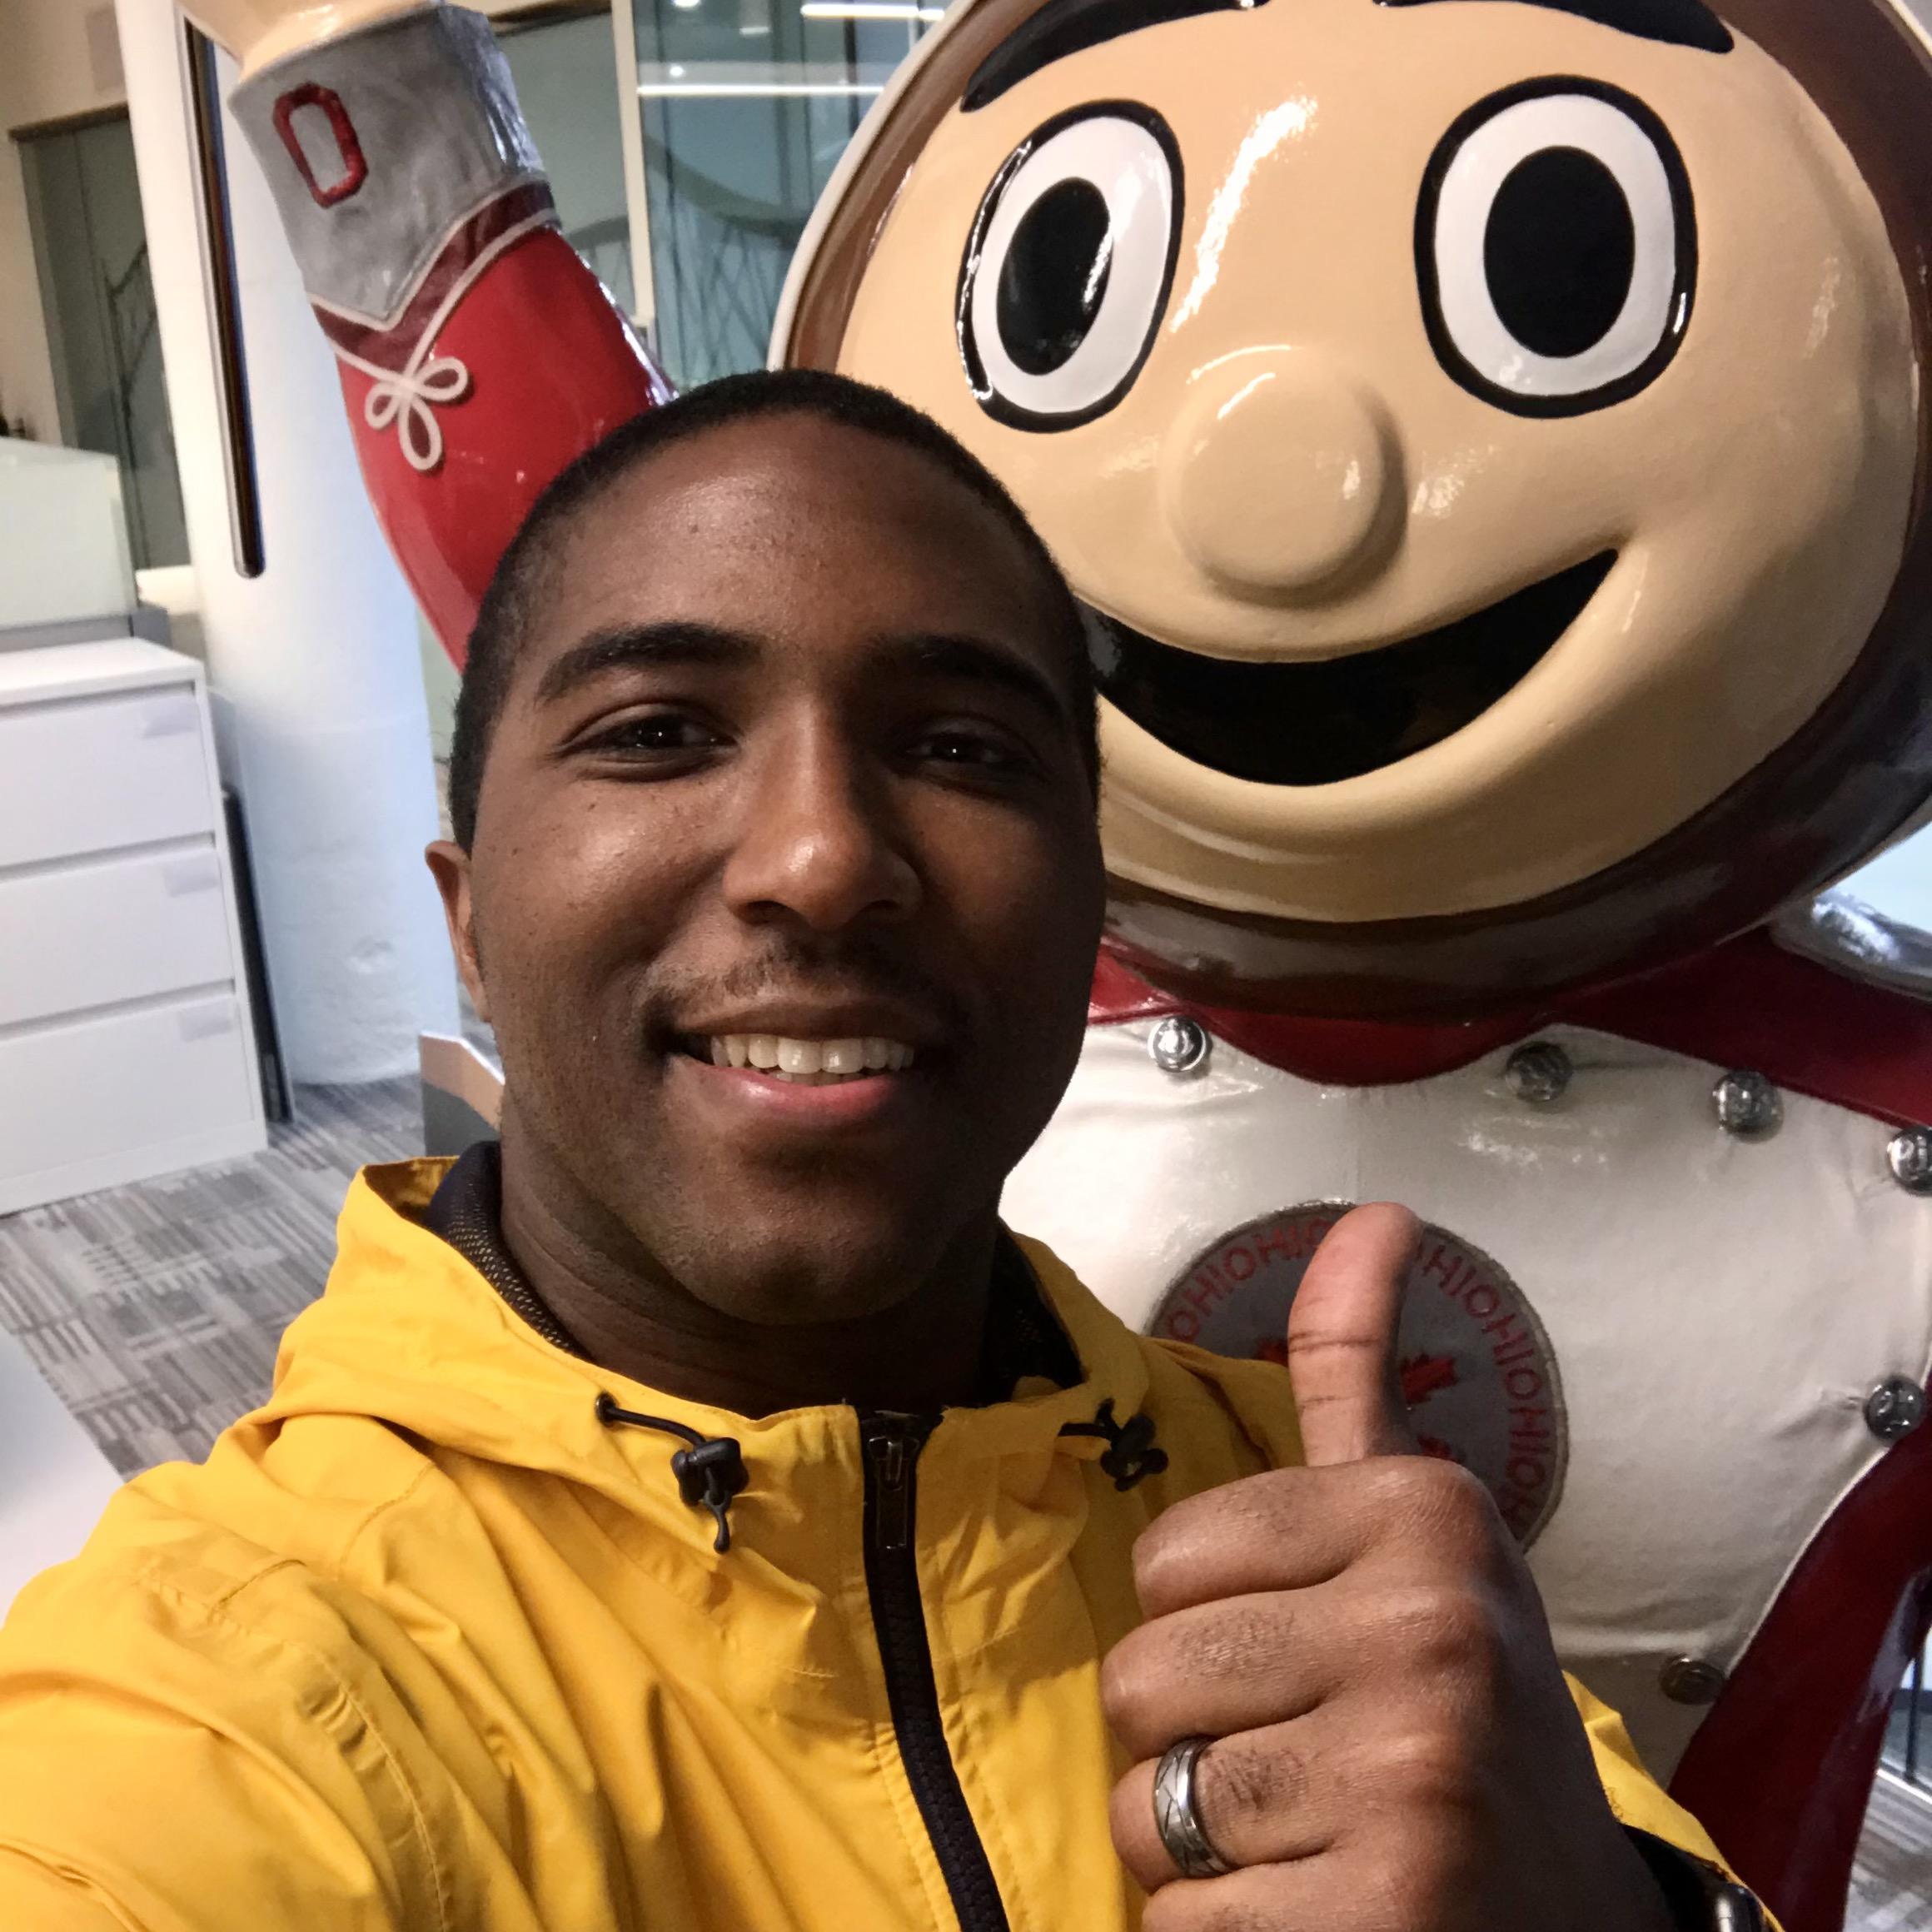 Yellow Kord employee with Brutus Buckeye mascot of Ohio State University